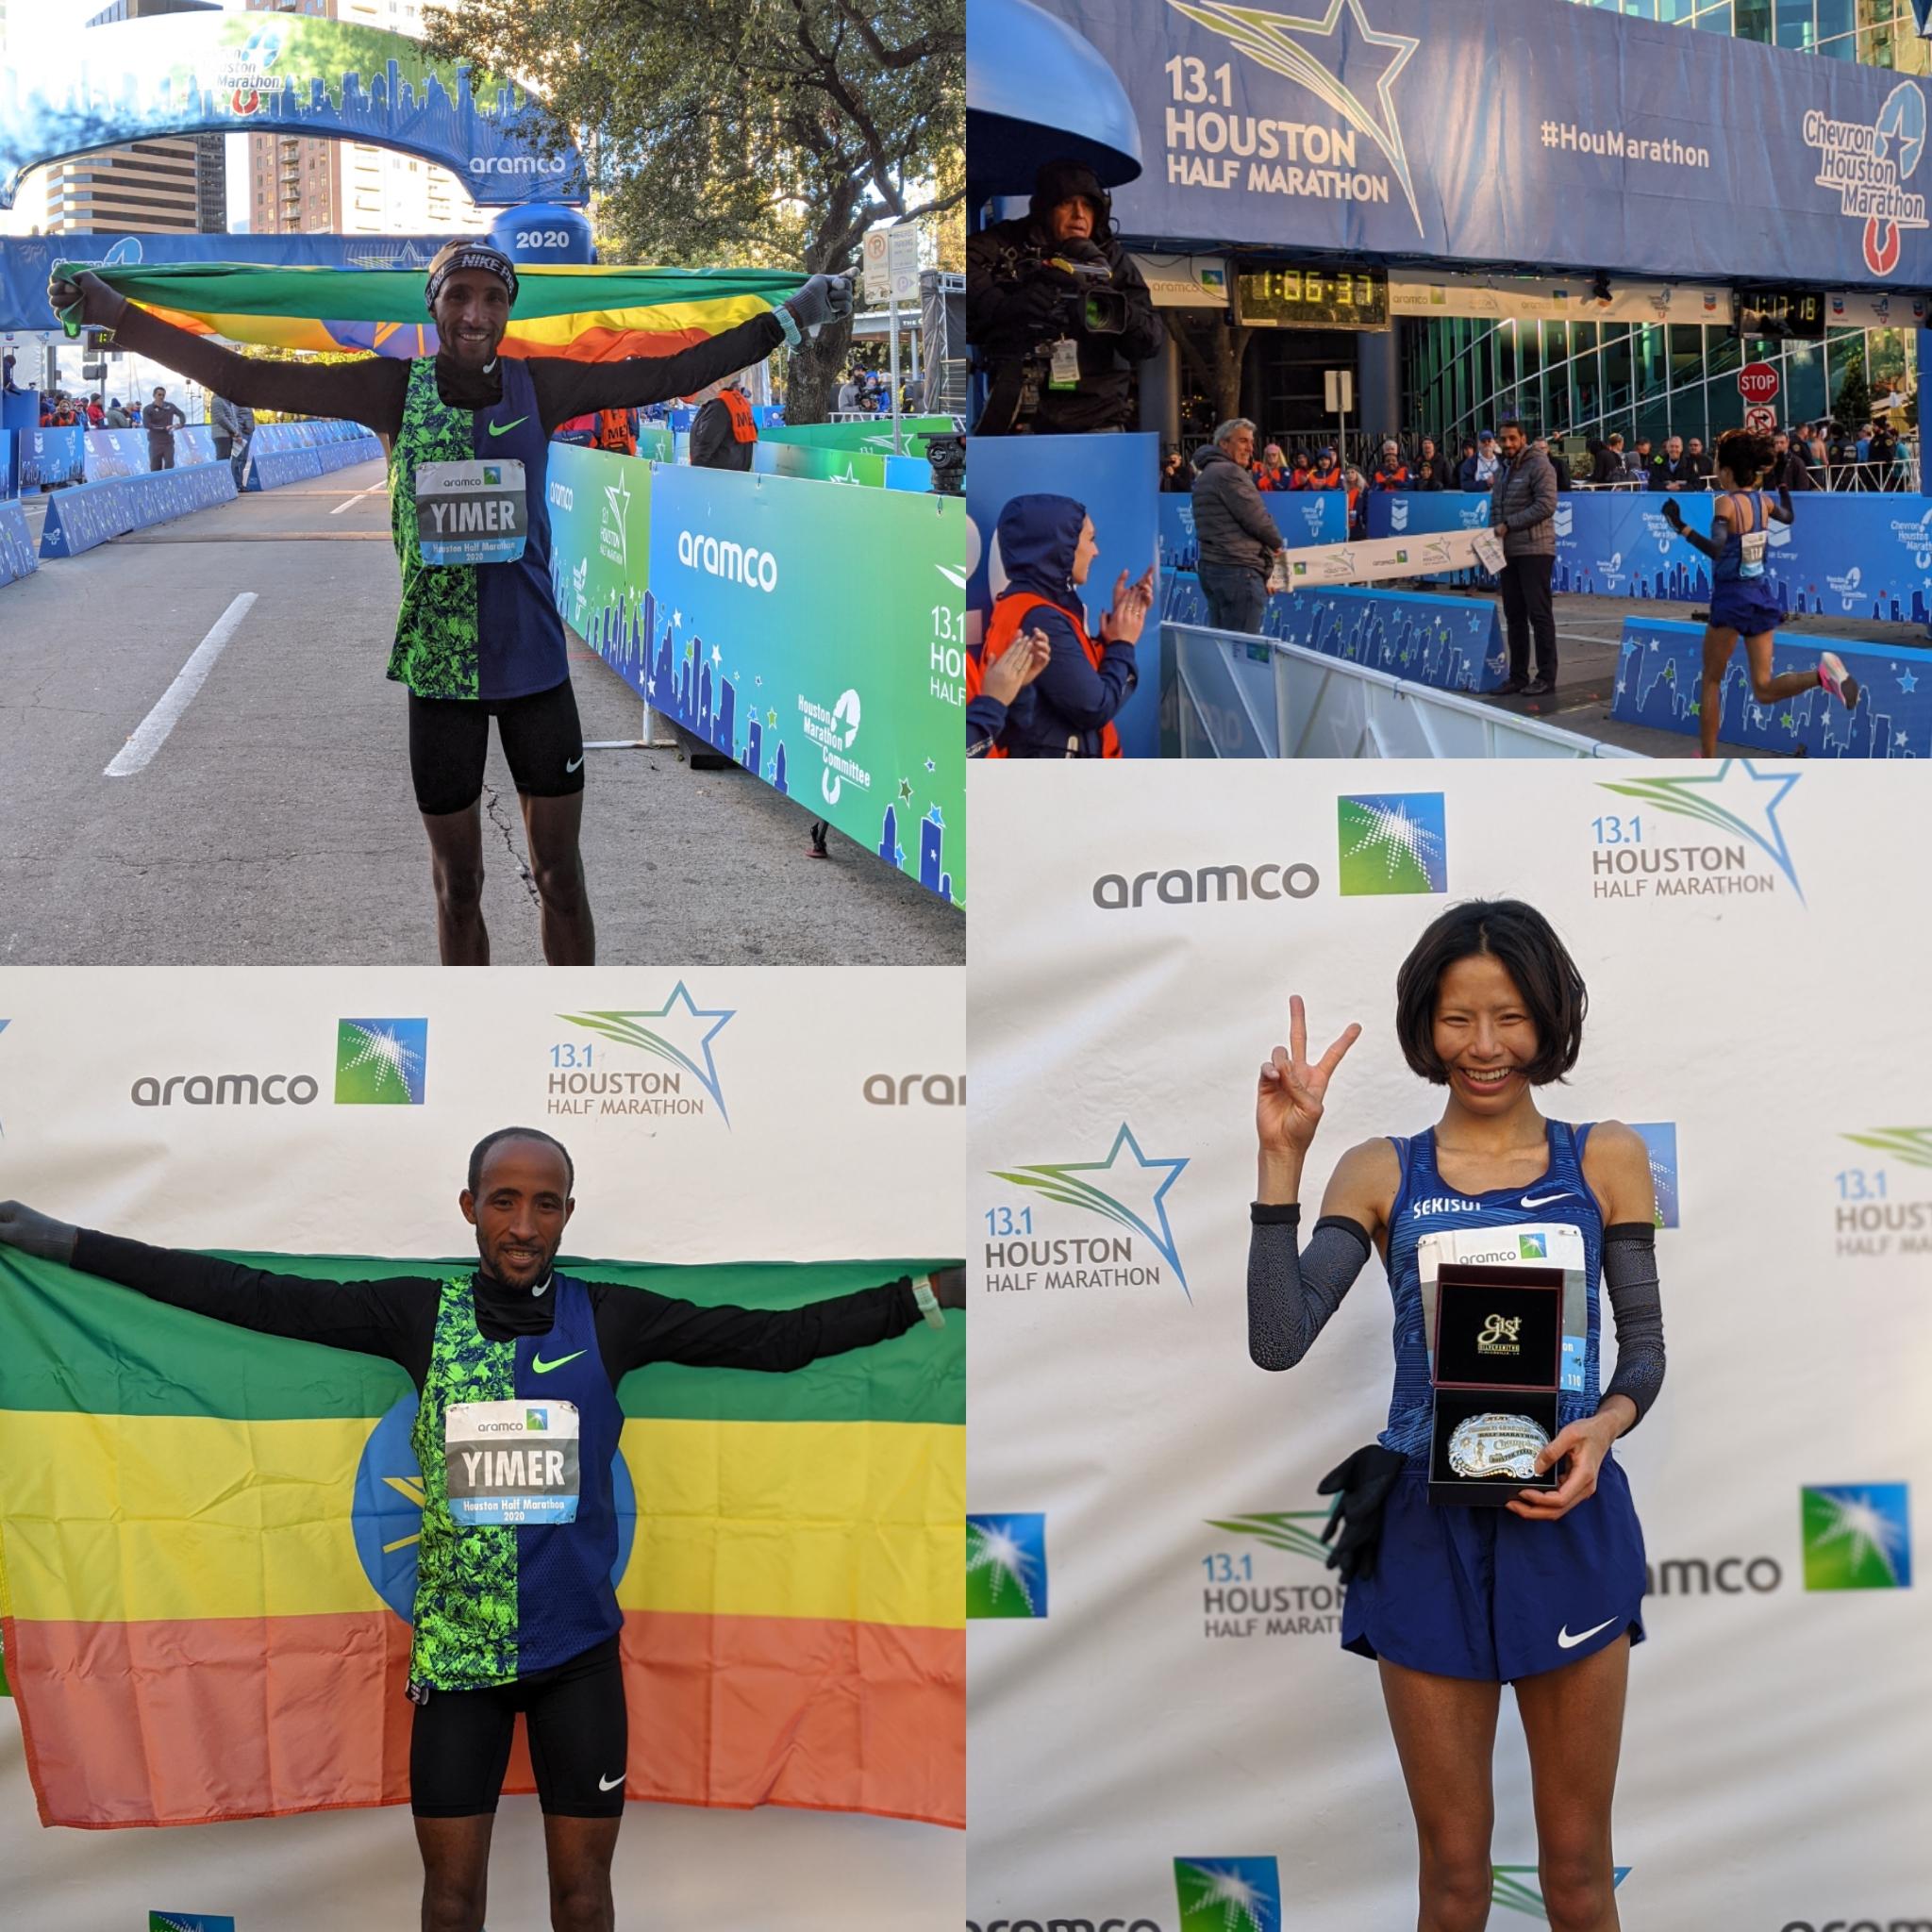 Half Marathon winners: Jemal Timer (Ethiopia) & Hitomi Niiya (Japan) 🏅 Congratulations #runhou #houhalf https://t.co/CHRNYZooKC